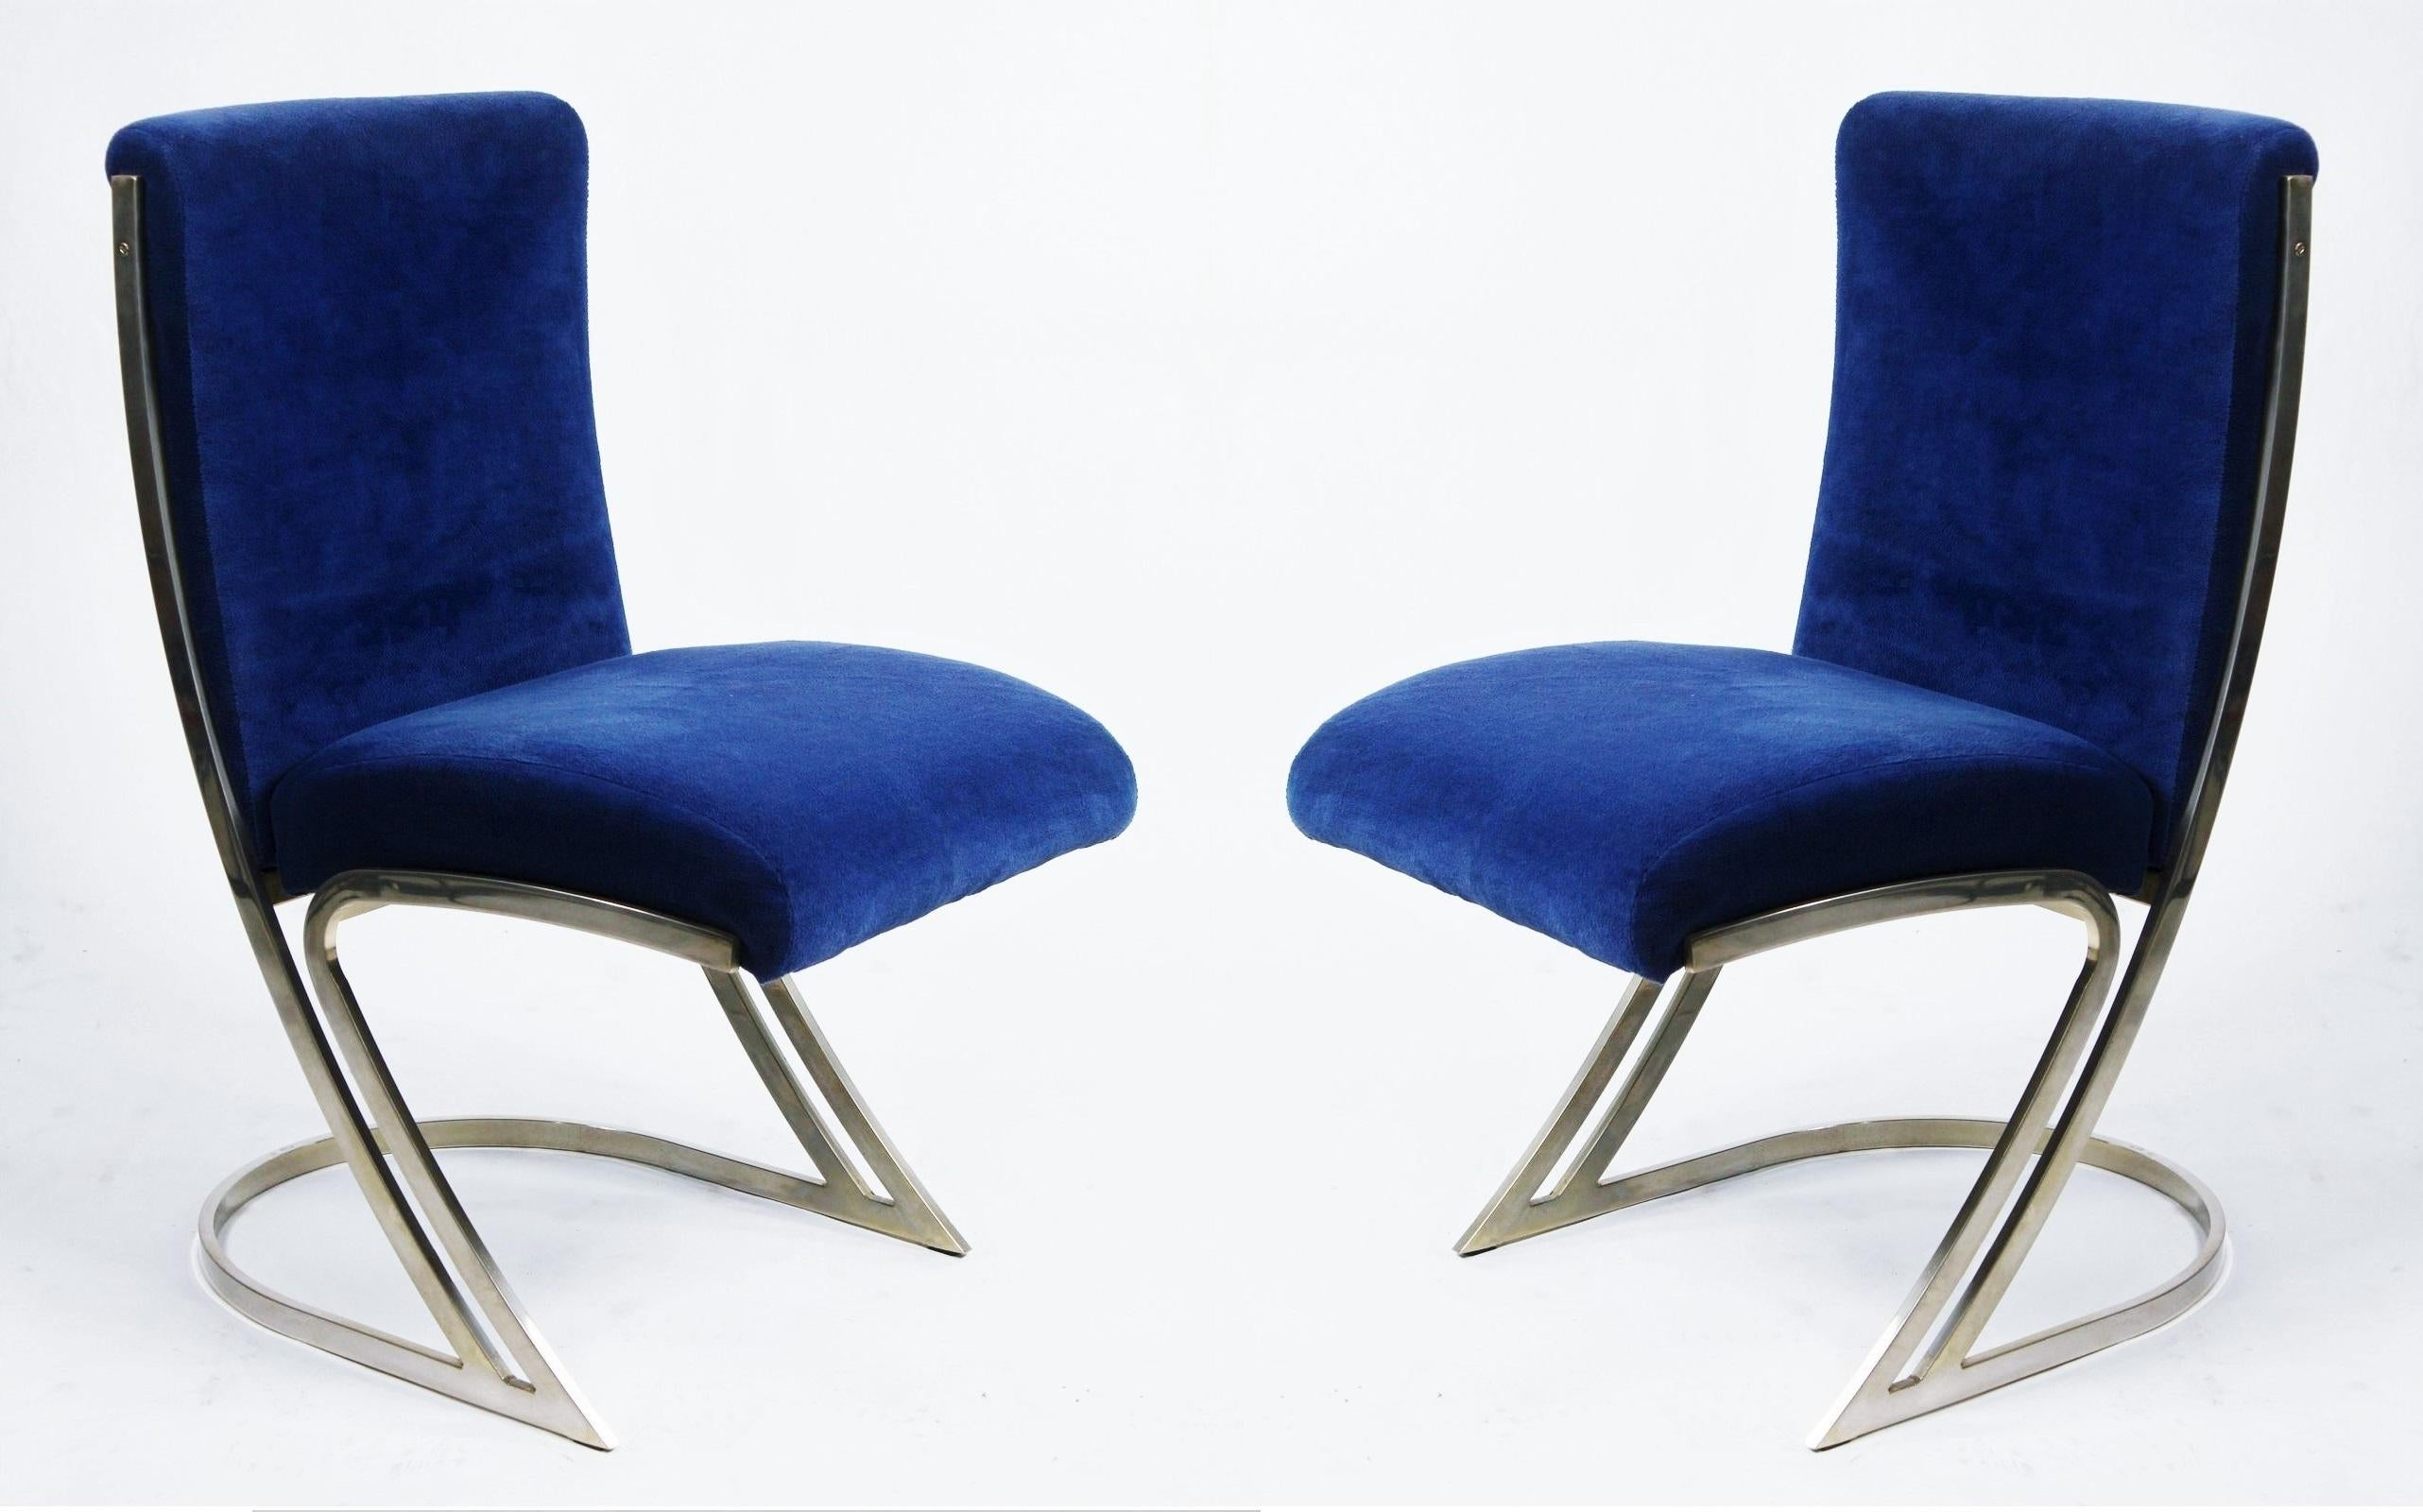 Four Pierre Cardin Chrome Dining Chairs In Blue Velvet